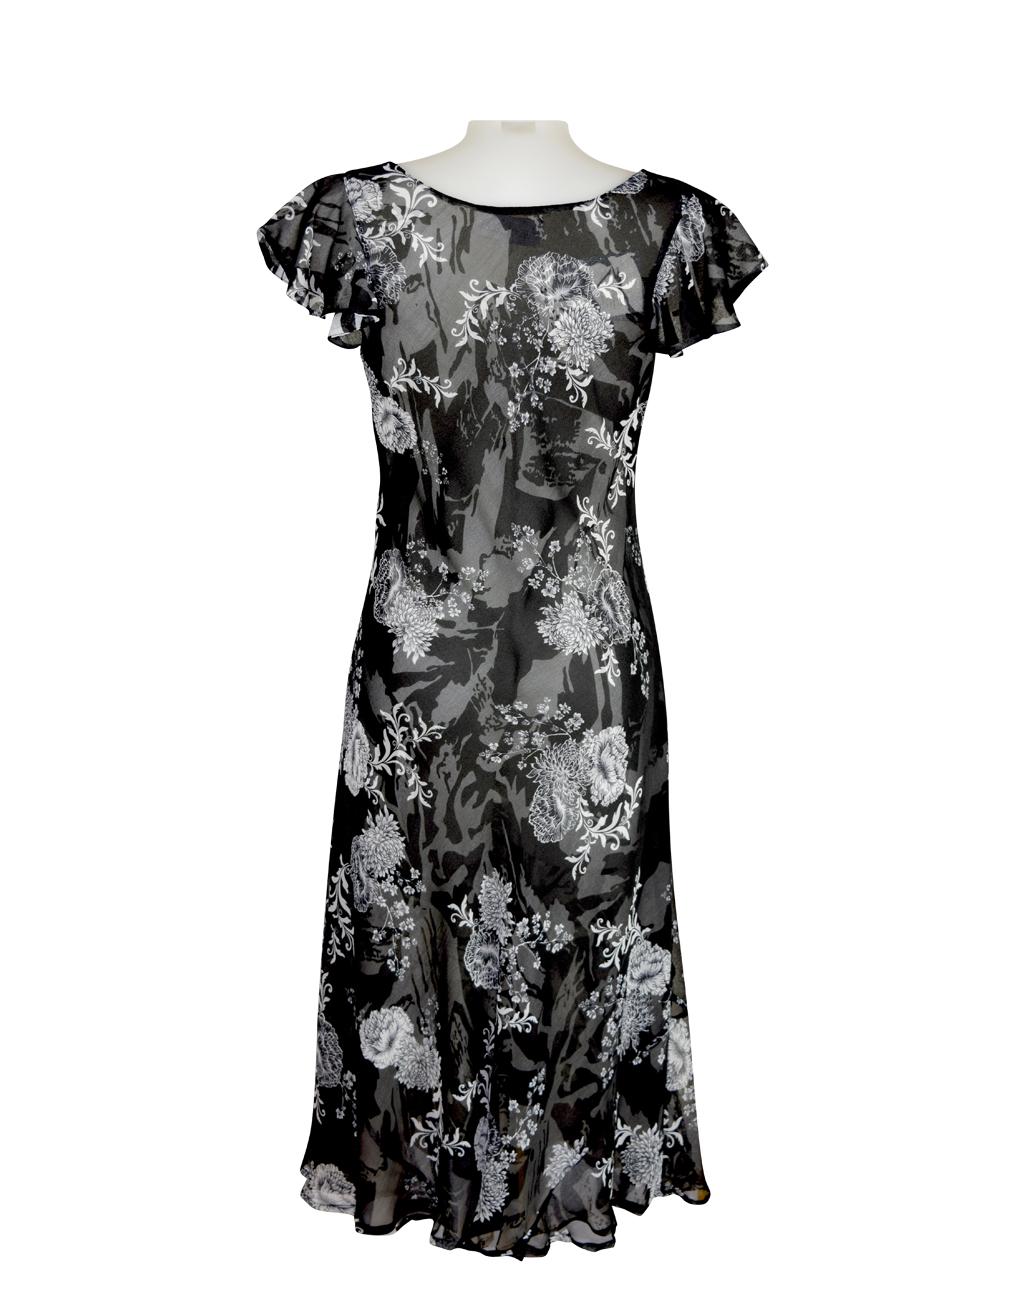 Paramour Reversible Dress Cap Sleeve Black & White9